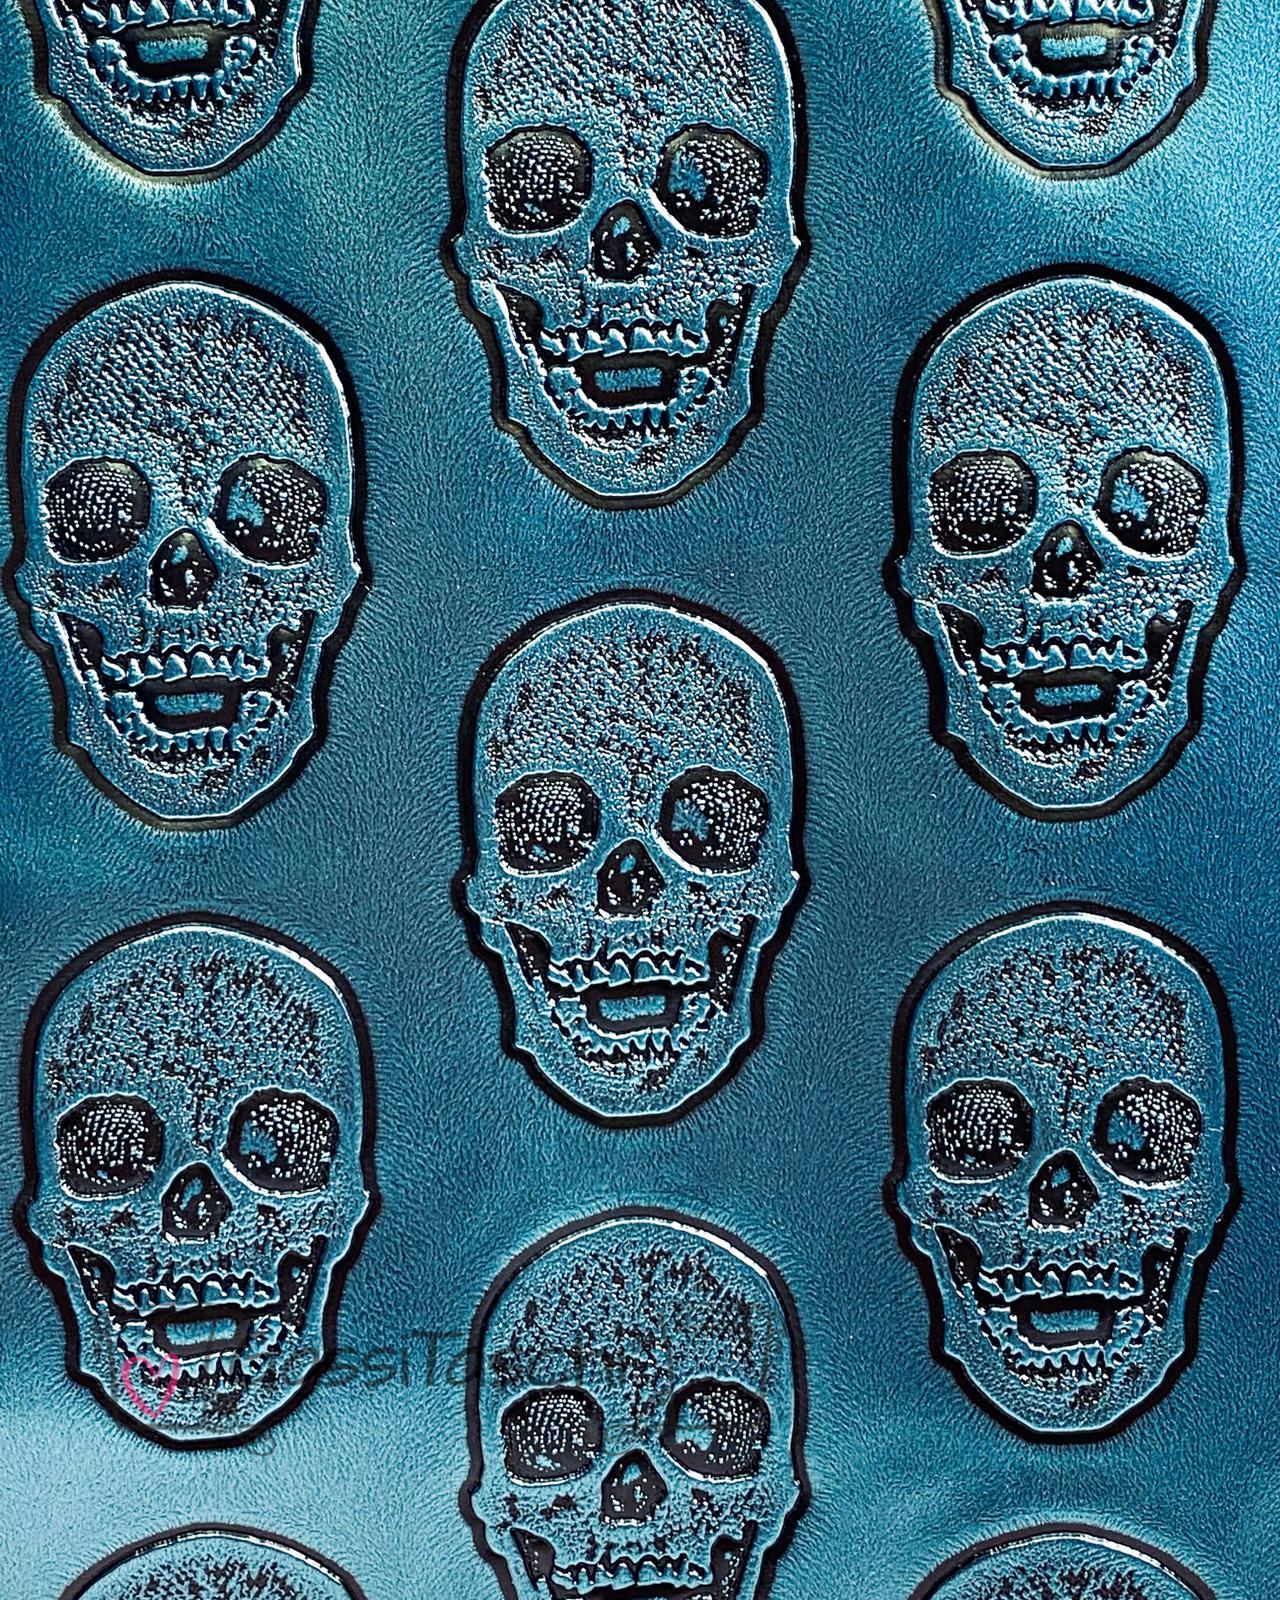 019B-082-Totenkopf-blau-metallic